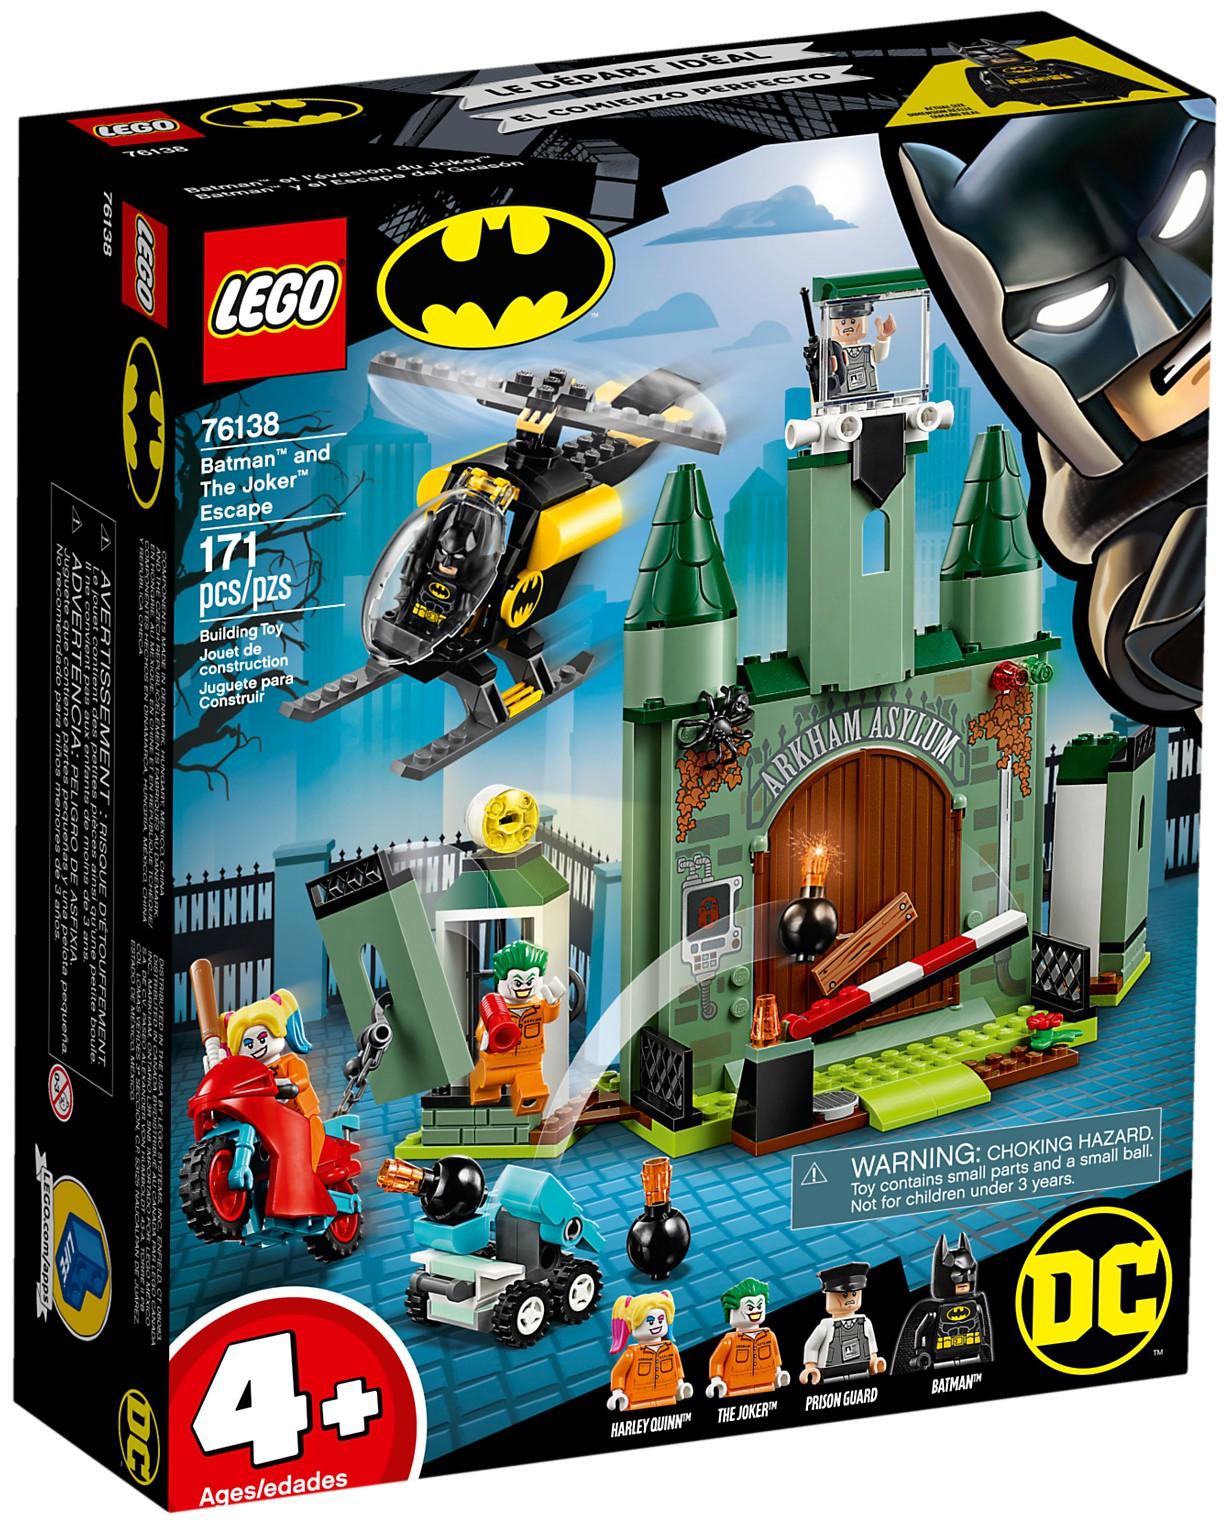 76138 Batman and the Joker Escape